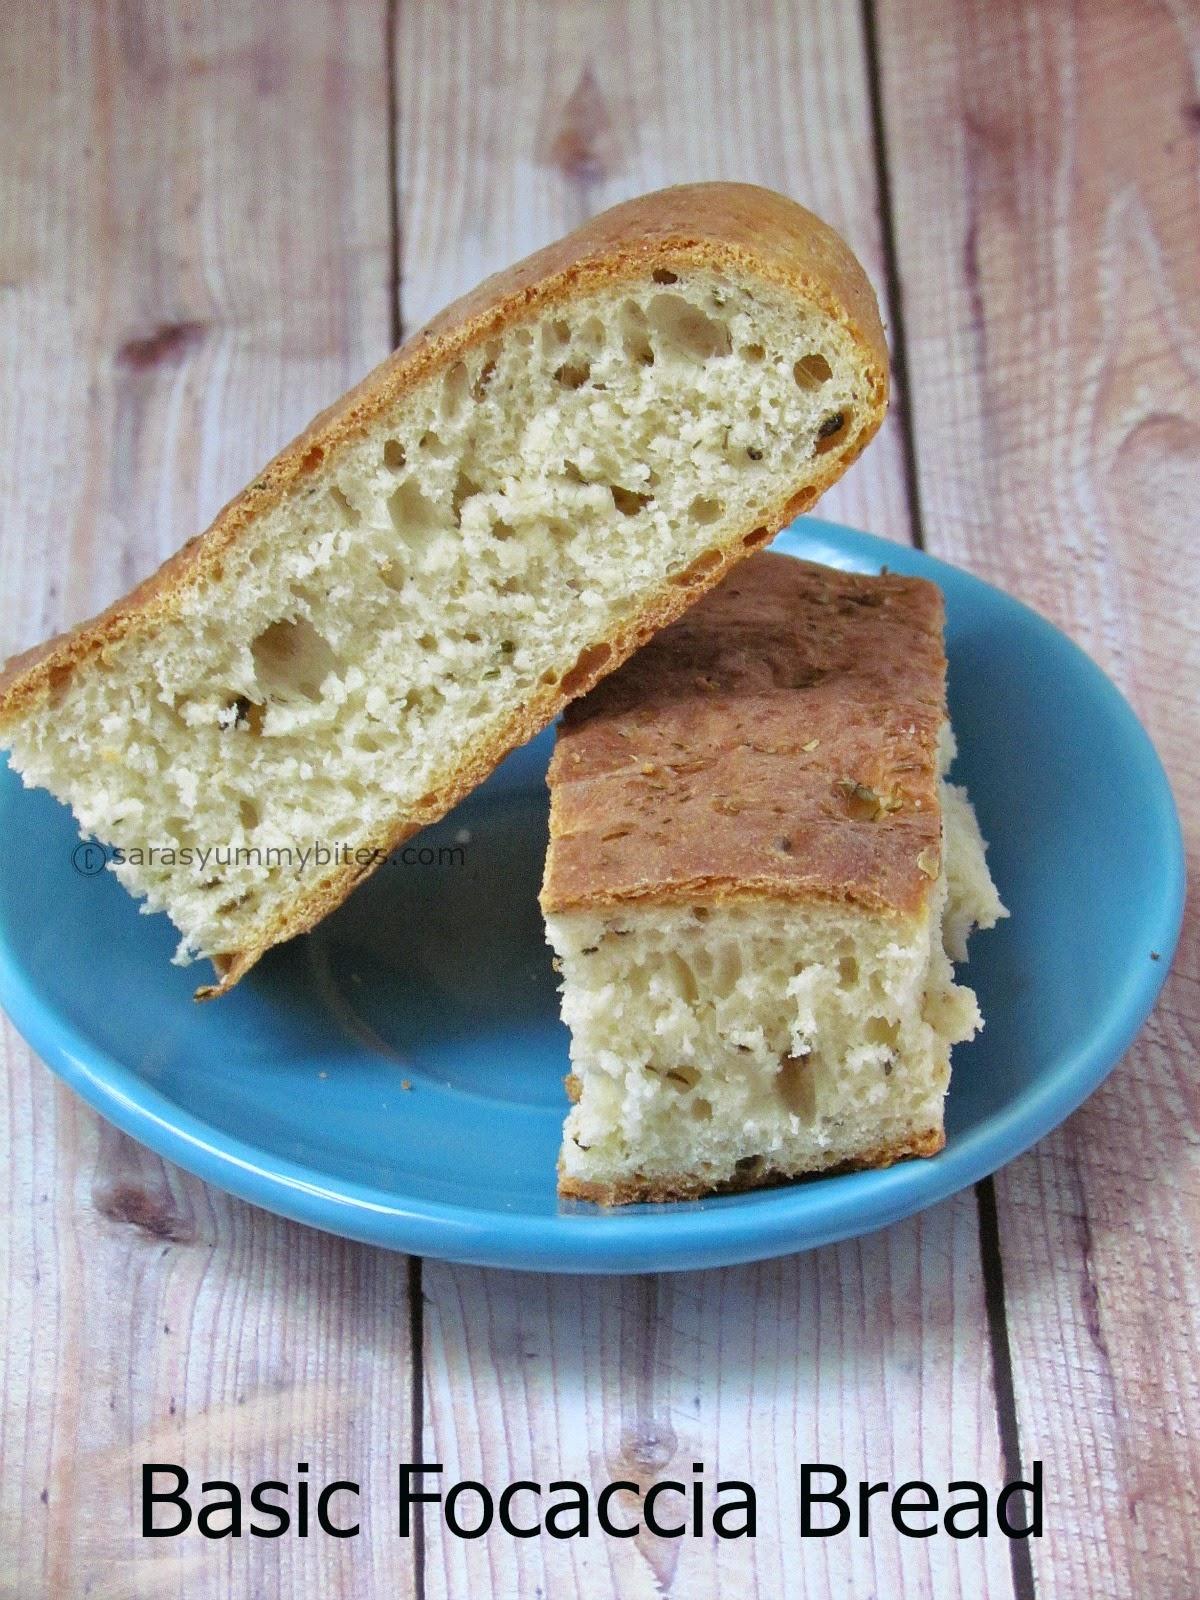 Basic Focaccia Bread